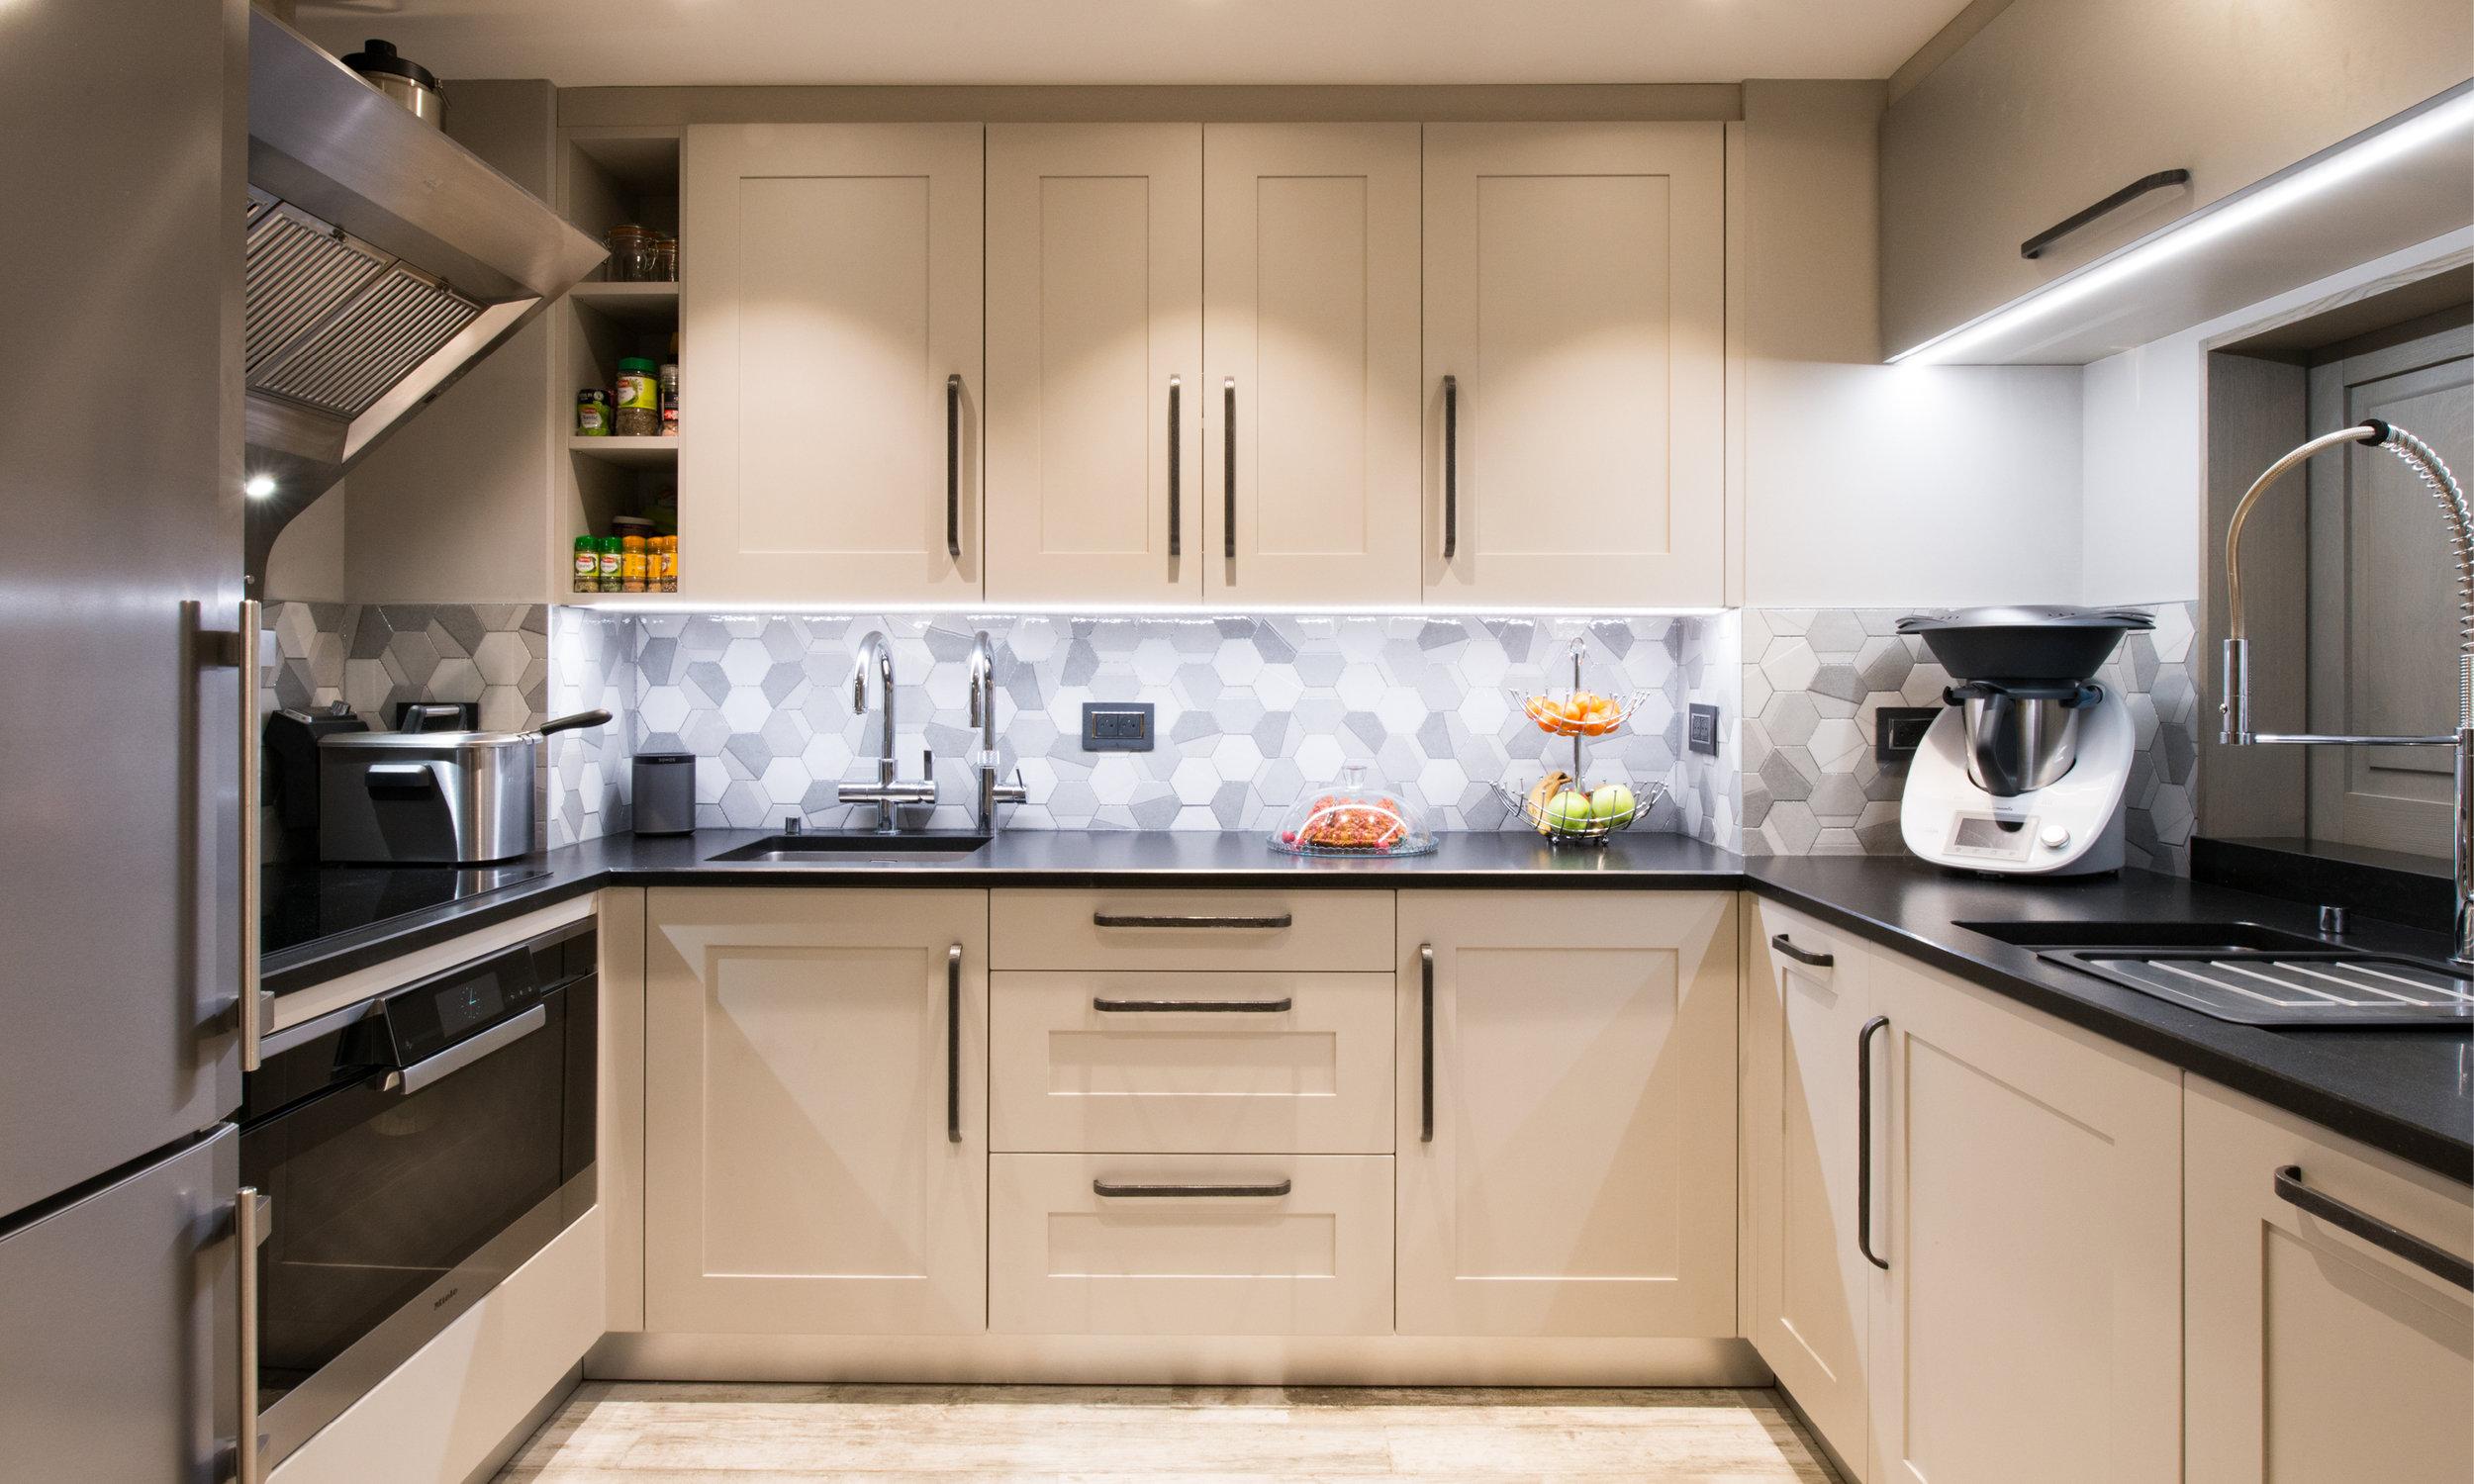 Courchevel Luxury rental provides gourmet cuisine